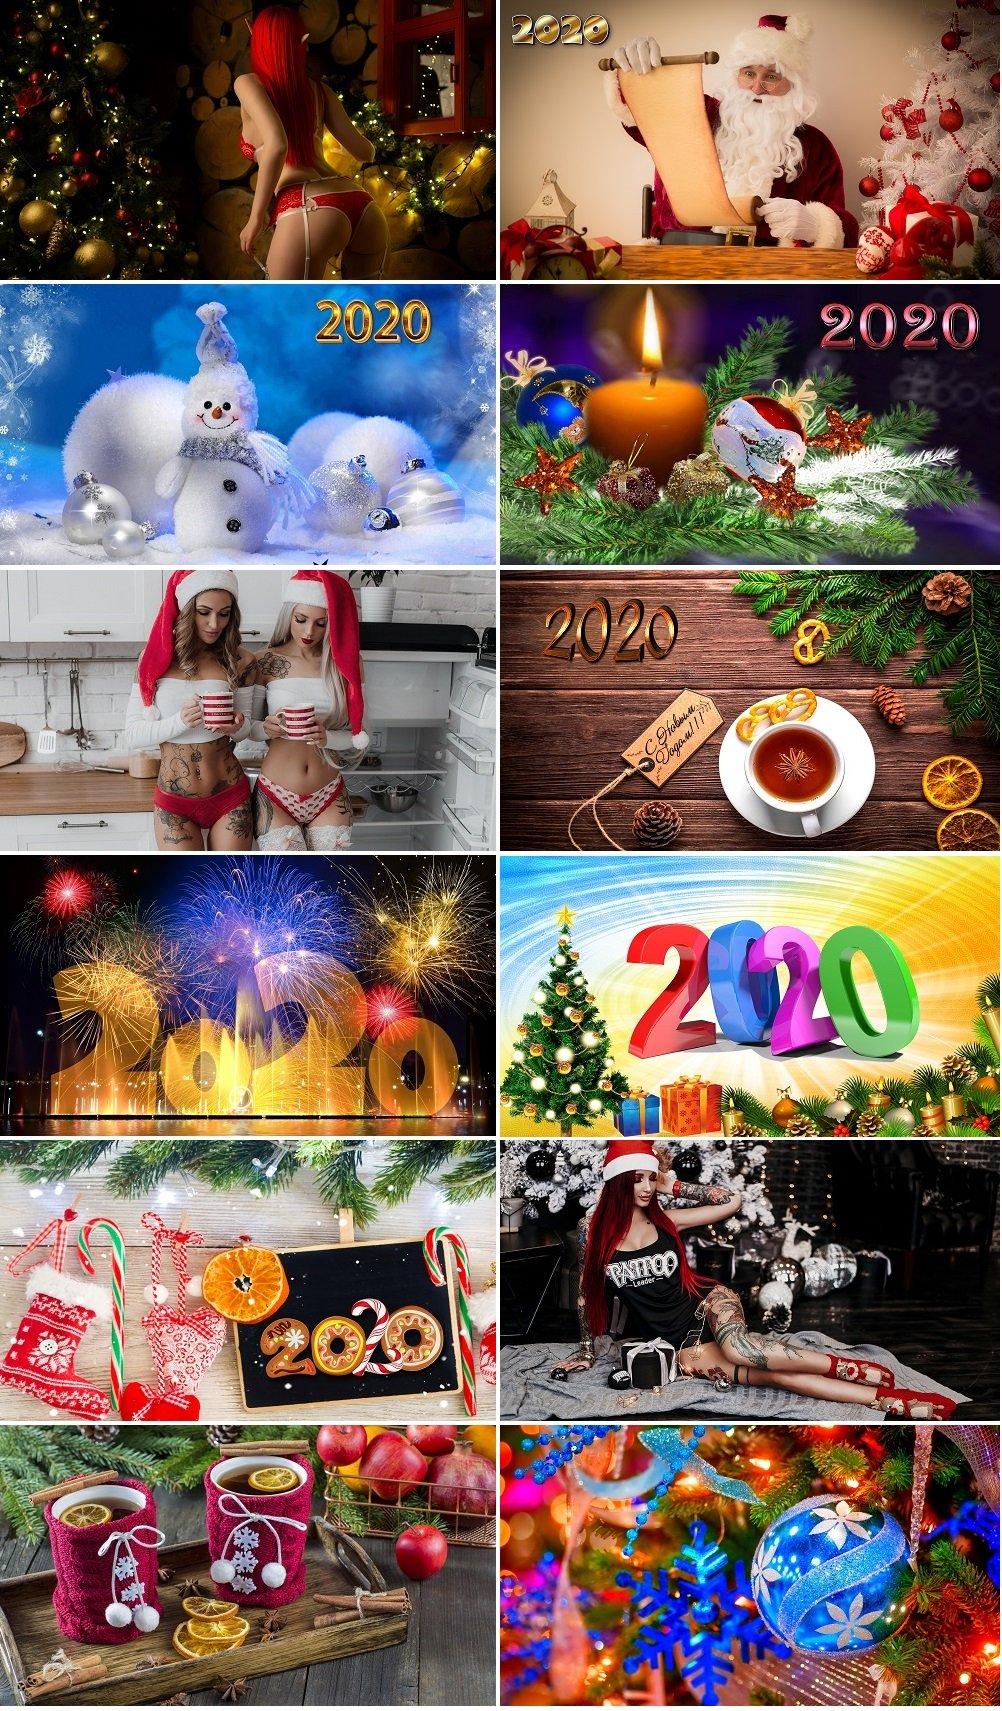 Download Desktop Wallpaper Happy New Year 2020 Softarchive